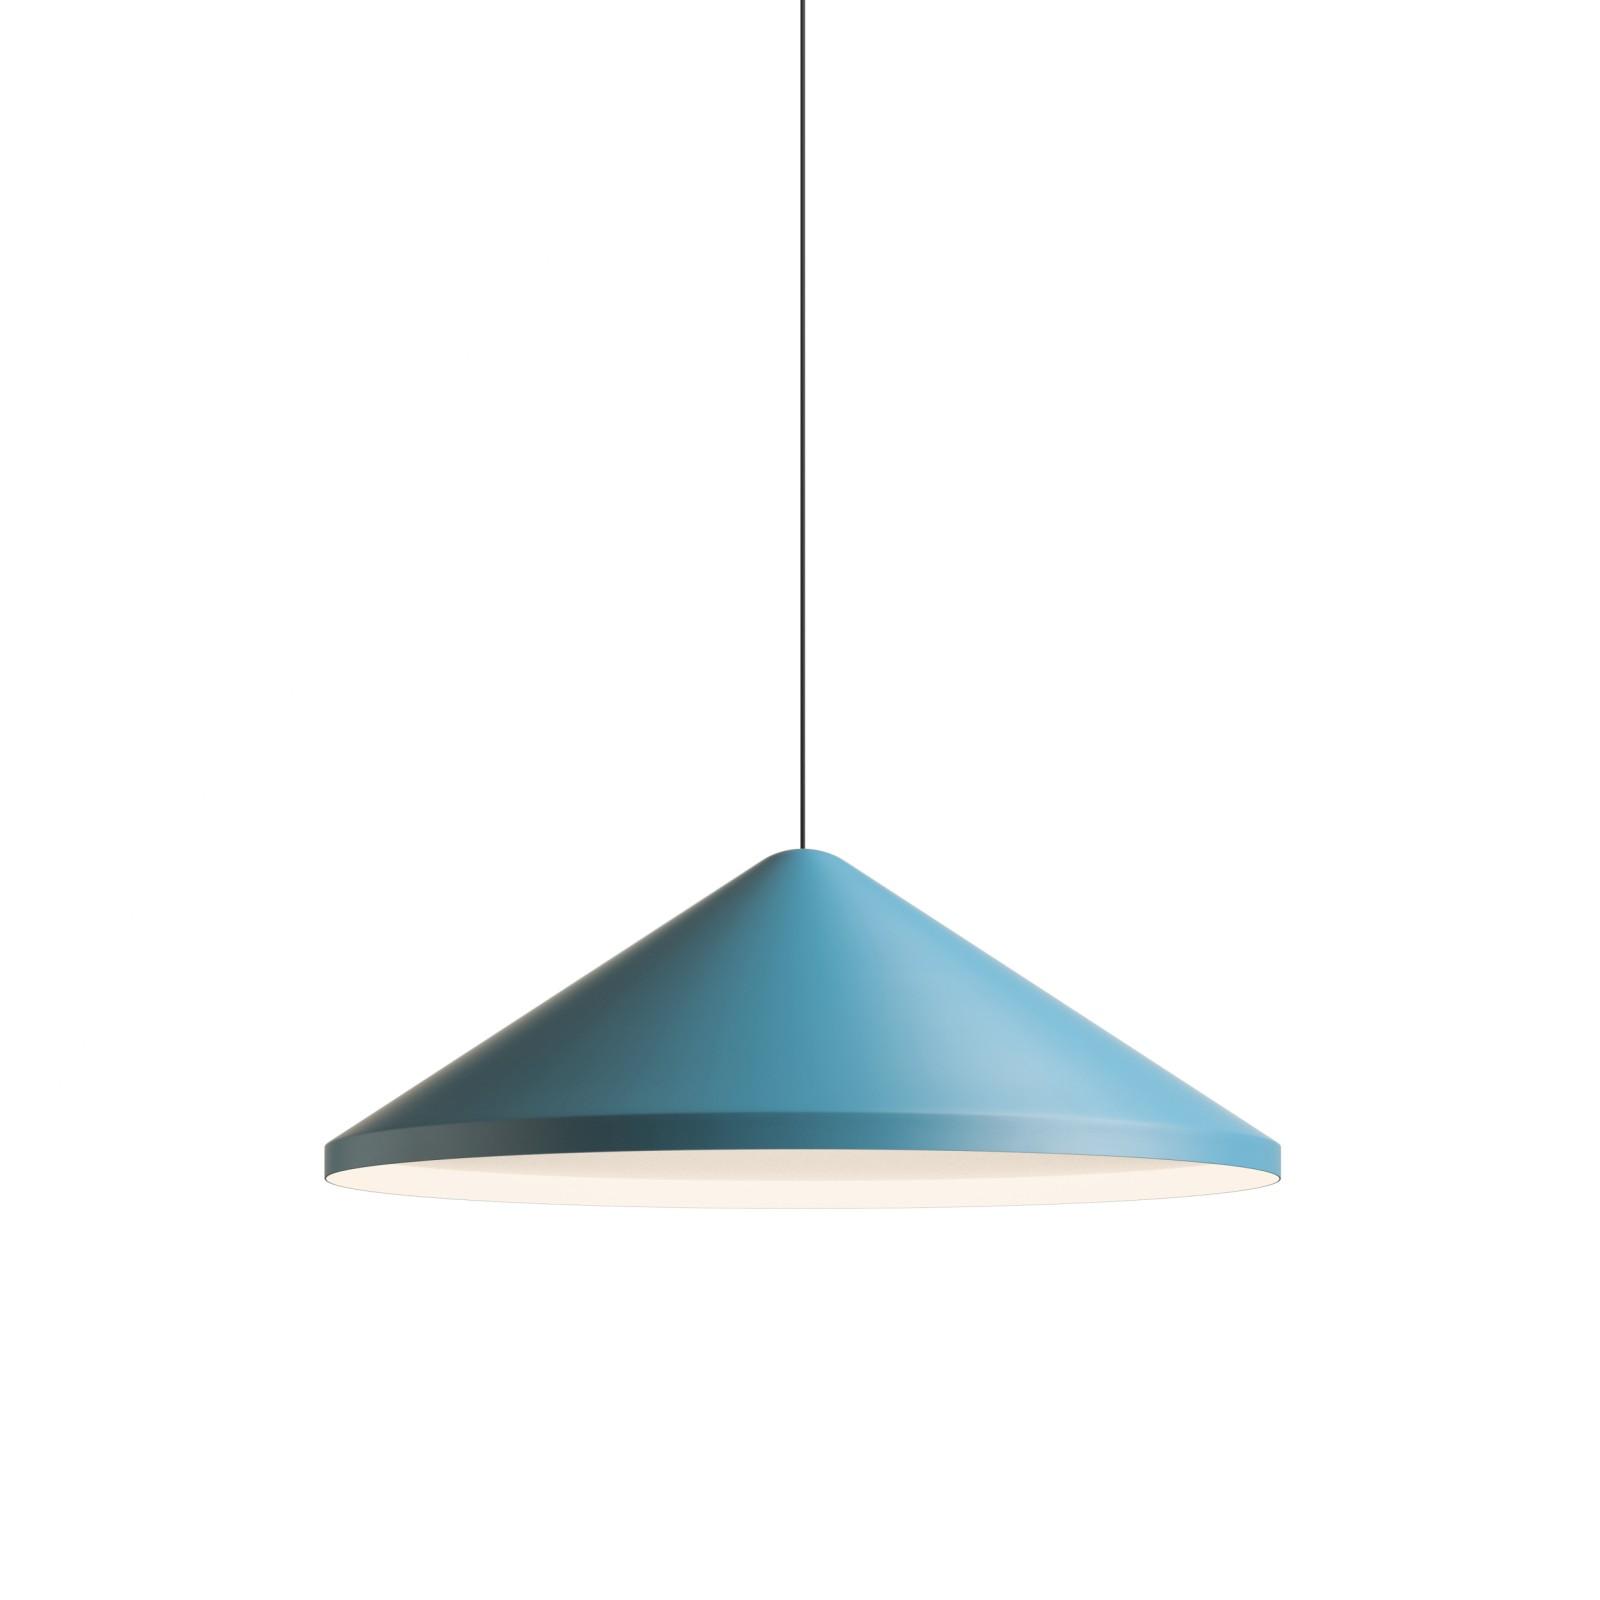 North Pendant Light Matt Blue Lacquer, 60cm